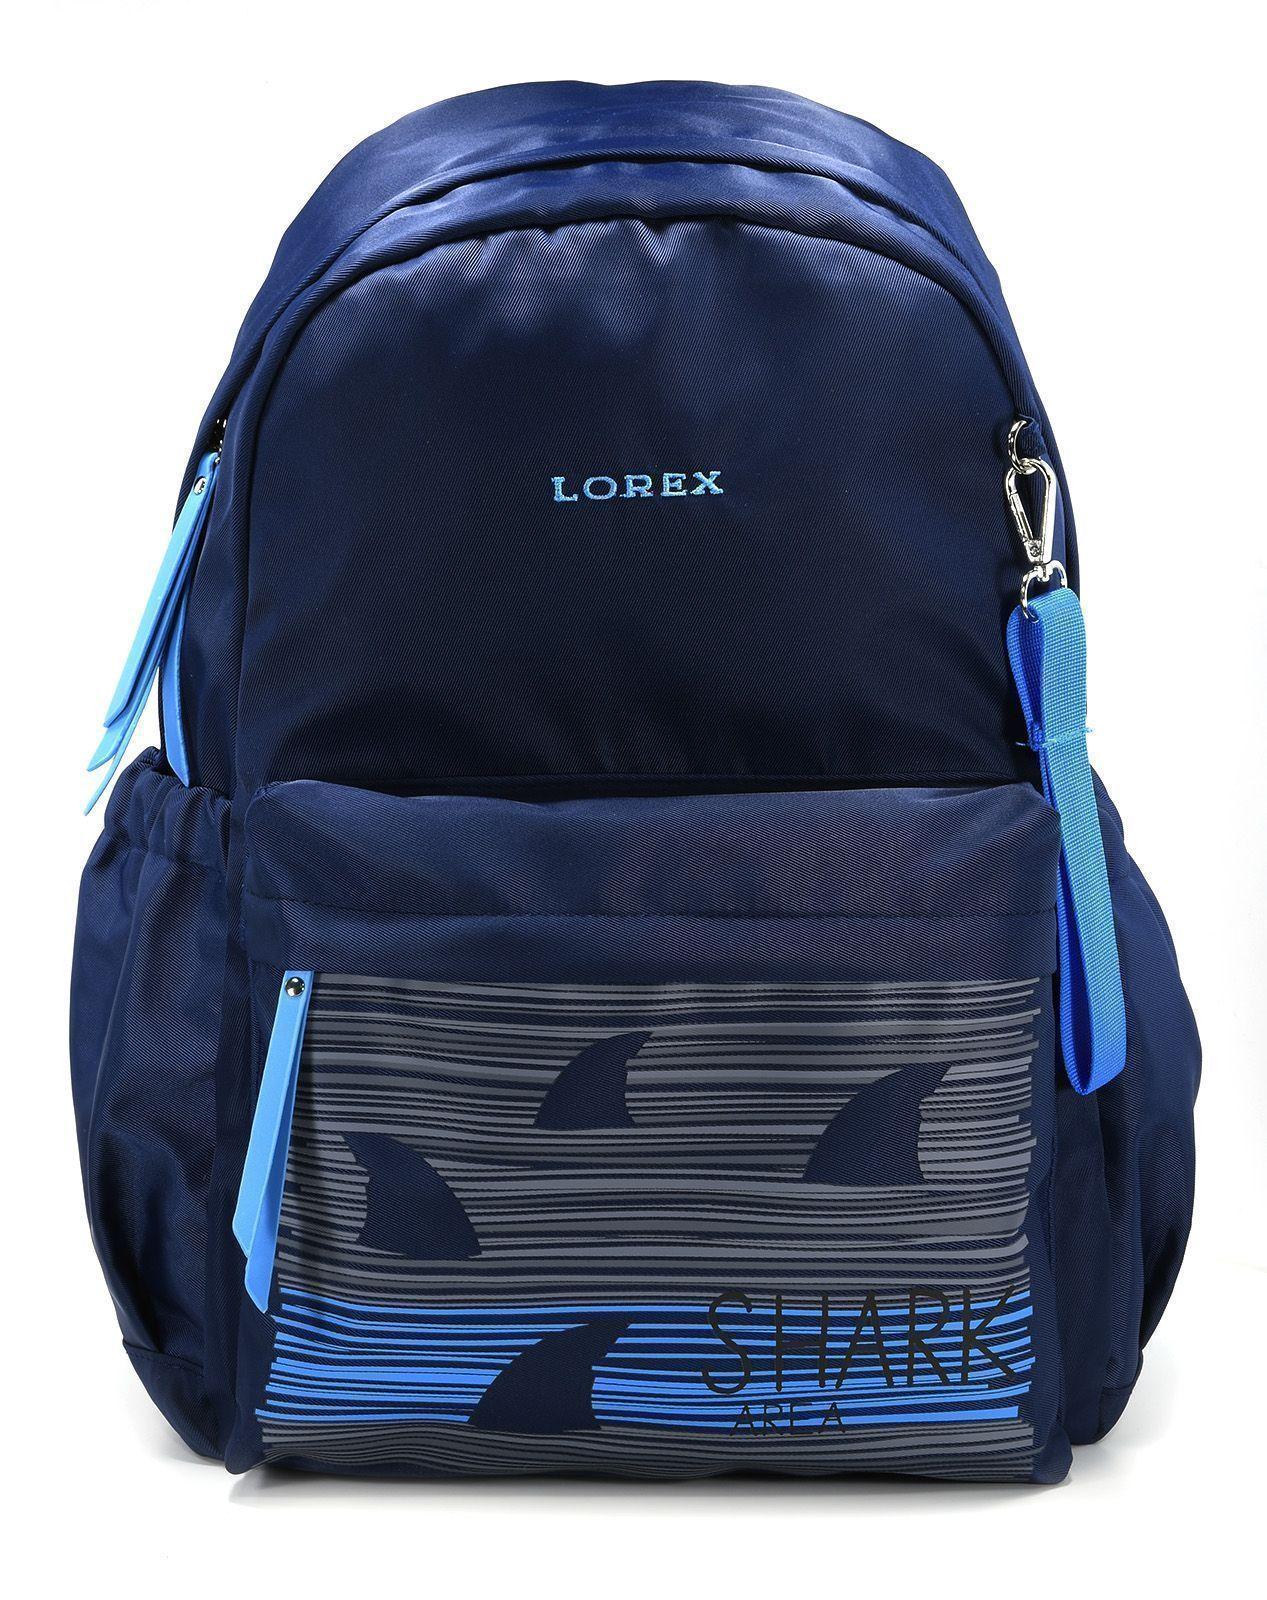 Рюкзак LOREX SHARK IN DARK, модель ERGONOMIC M12, мягкий каркас, односекционный, 46х32х15,5 см, 24 л, для мальчиков